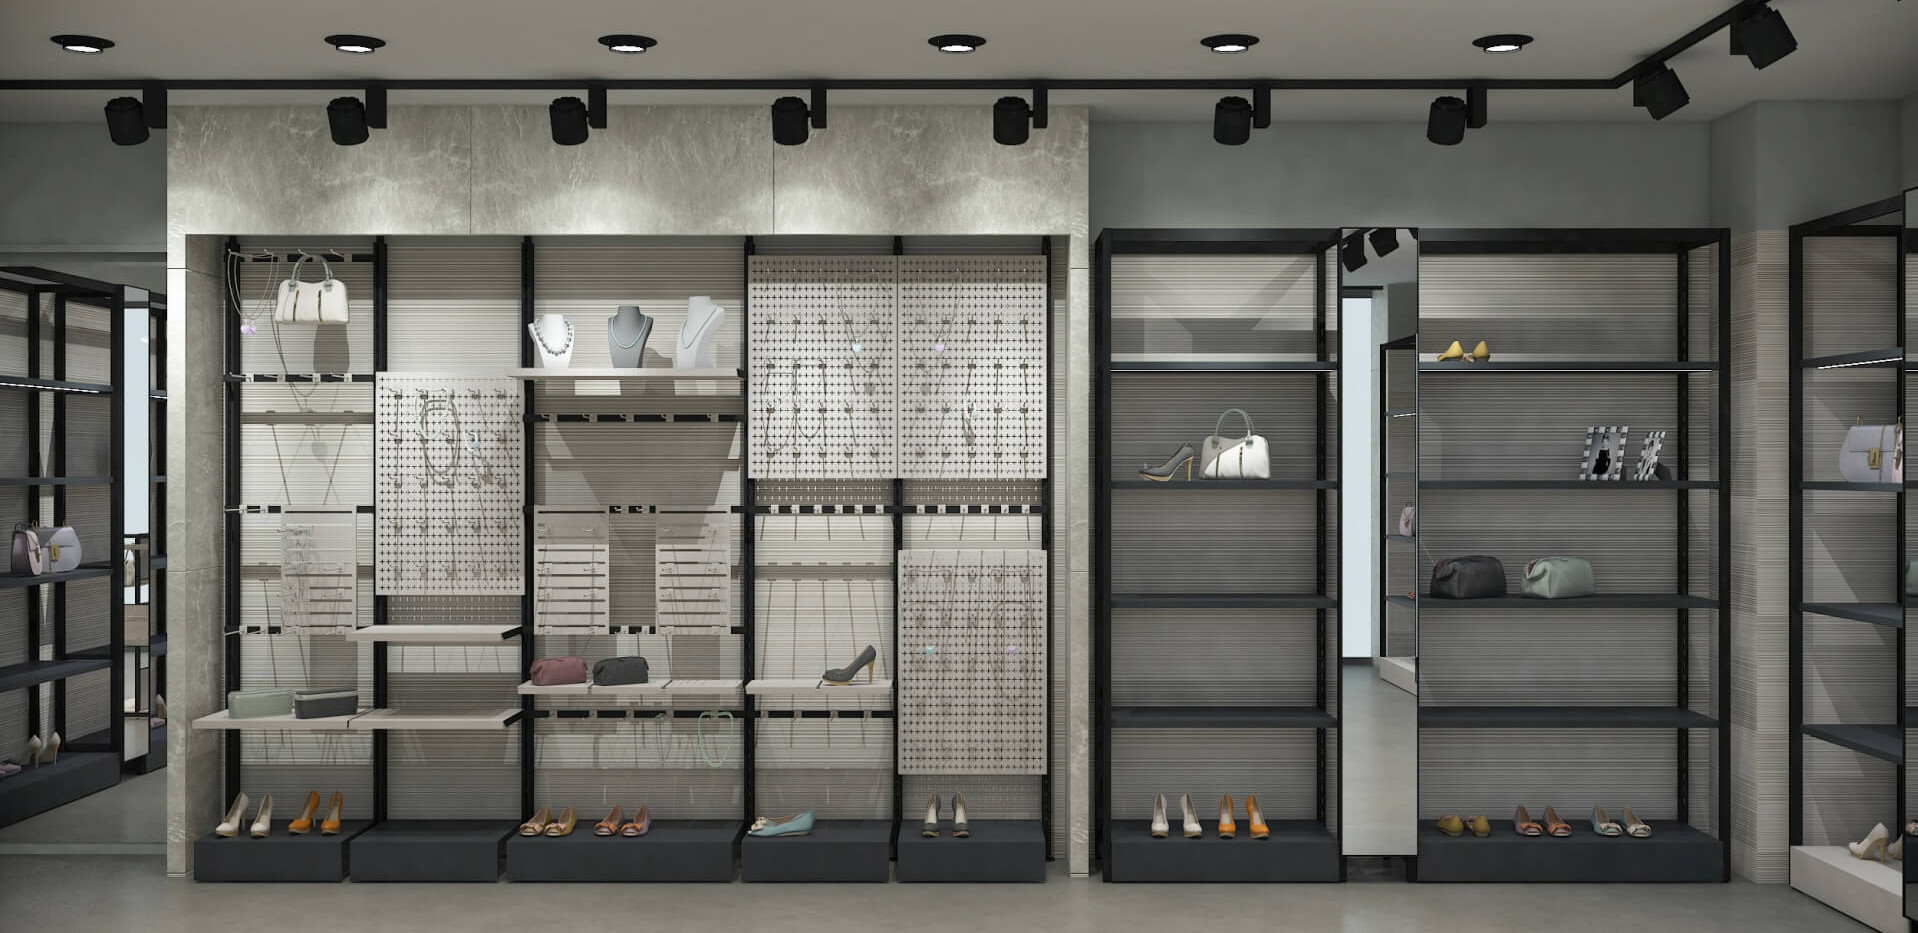 Corso - Shoes Store Shop Design-2.jpg